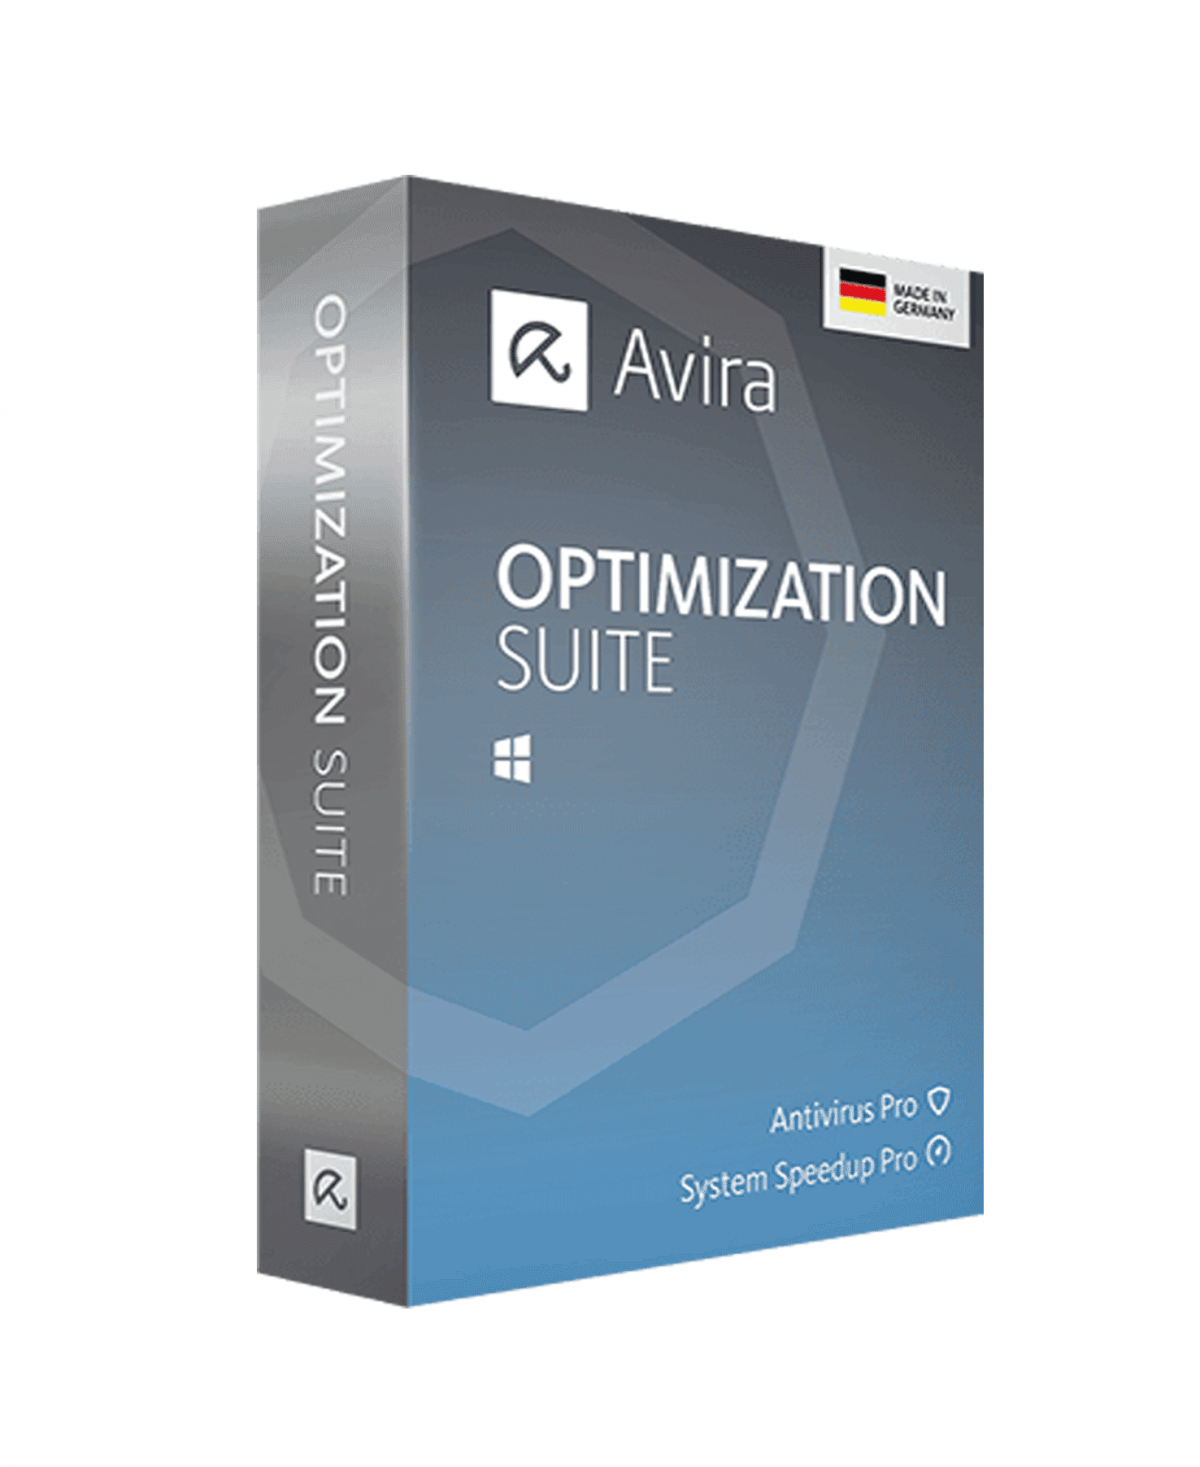 Avira-Optimization-Suite-2020